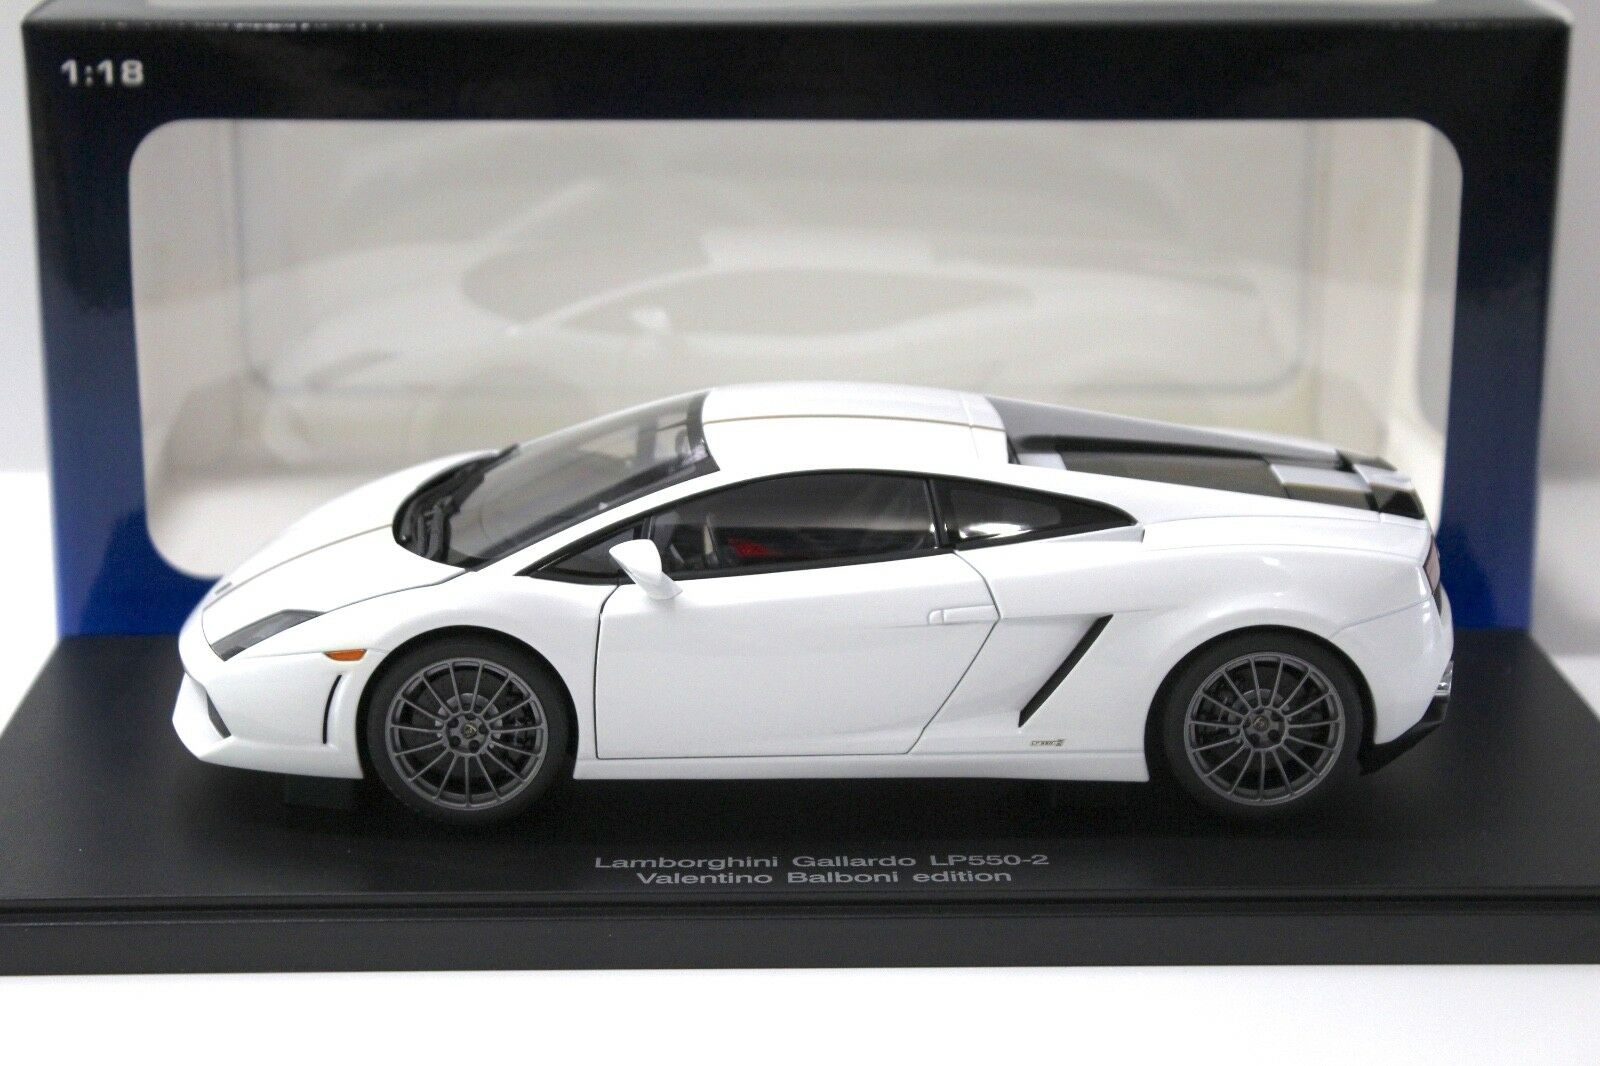 1:18 Autoart LAMBORGHINI GALLARDO lp550-2 Balboni bianca  NEW in Premium-MODELCAR